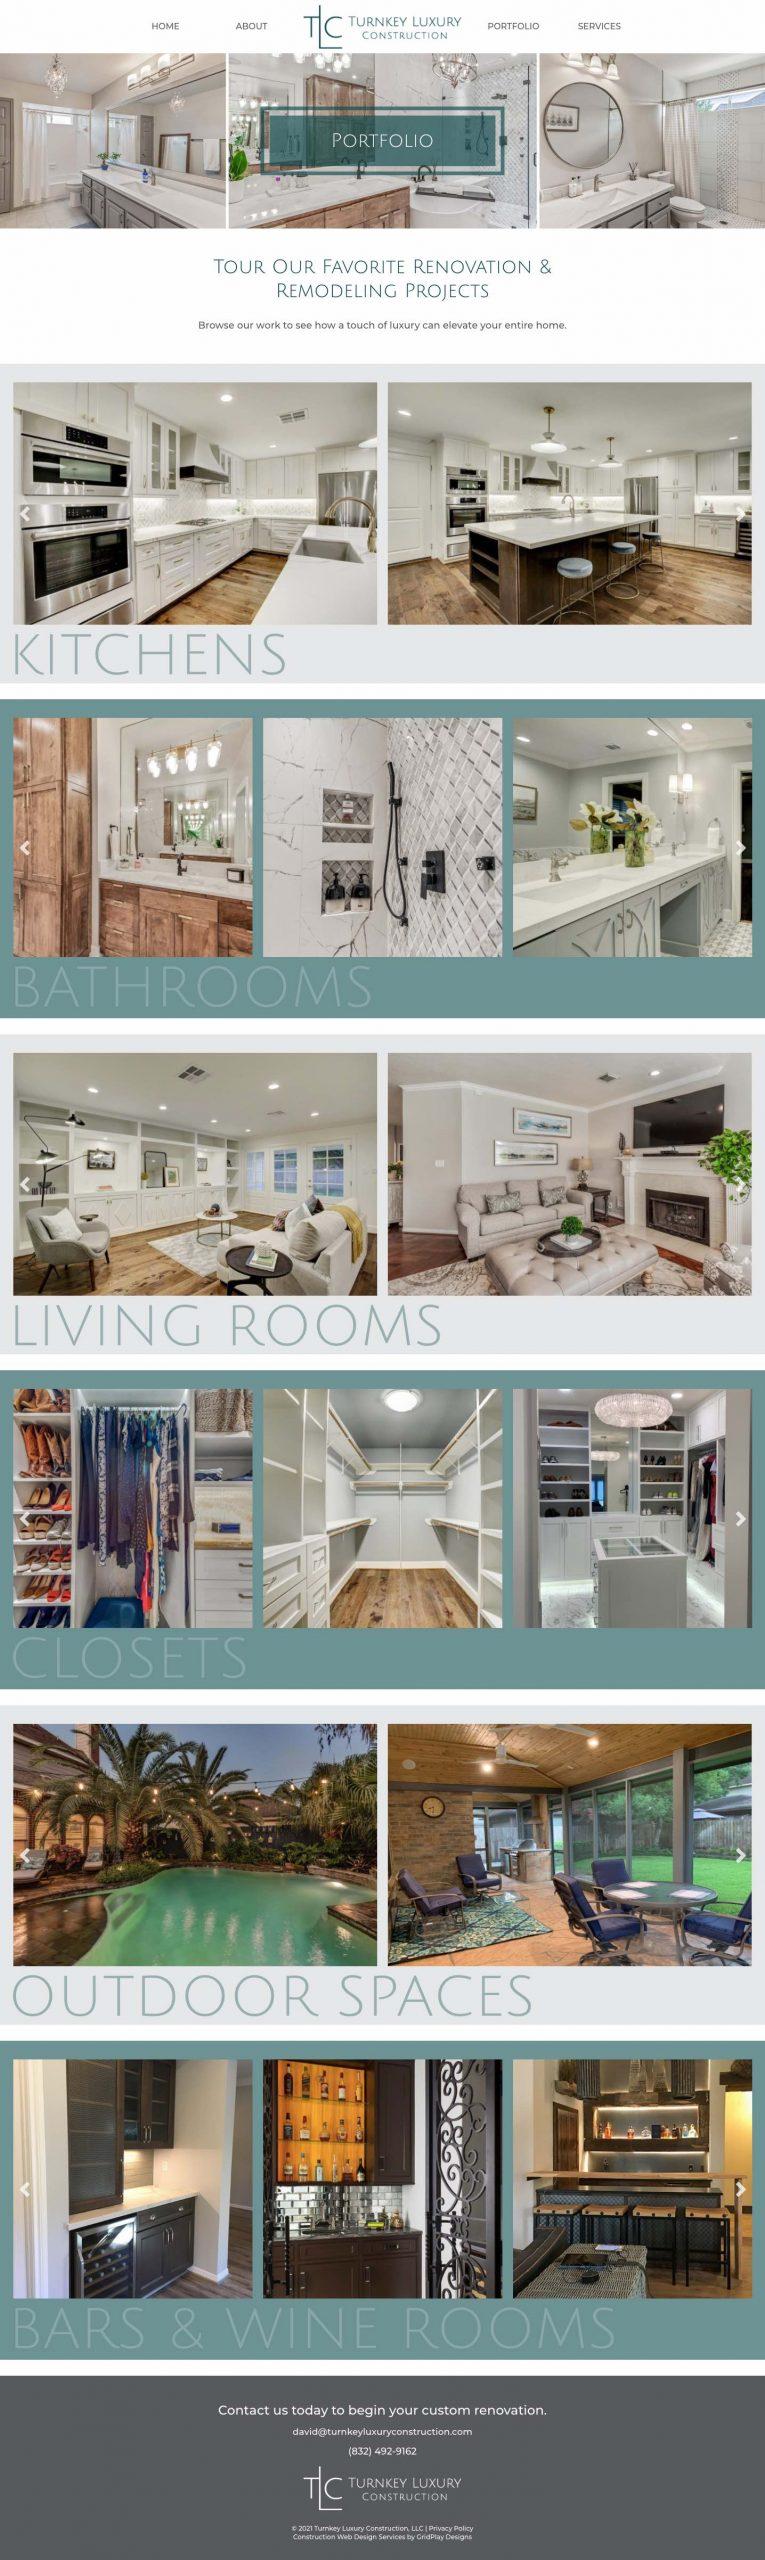 Turnkey Luxury Construction Portfolio Page